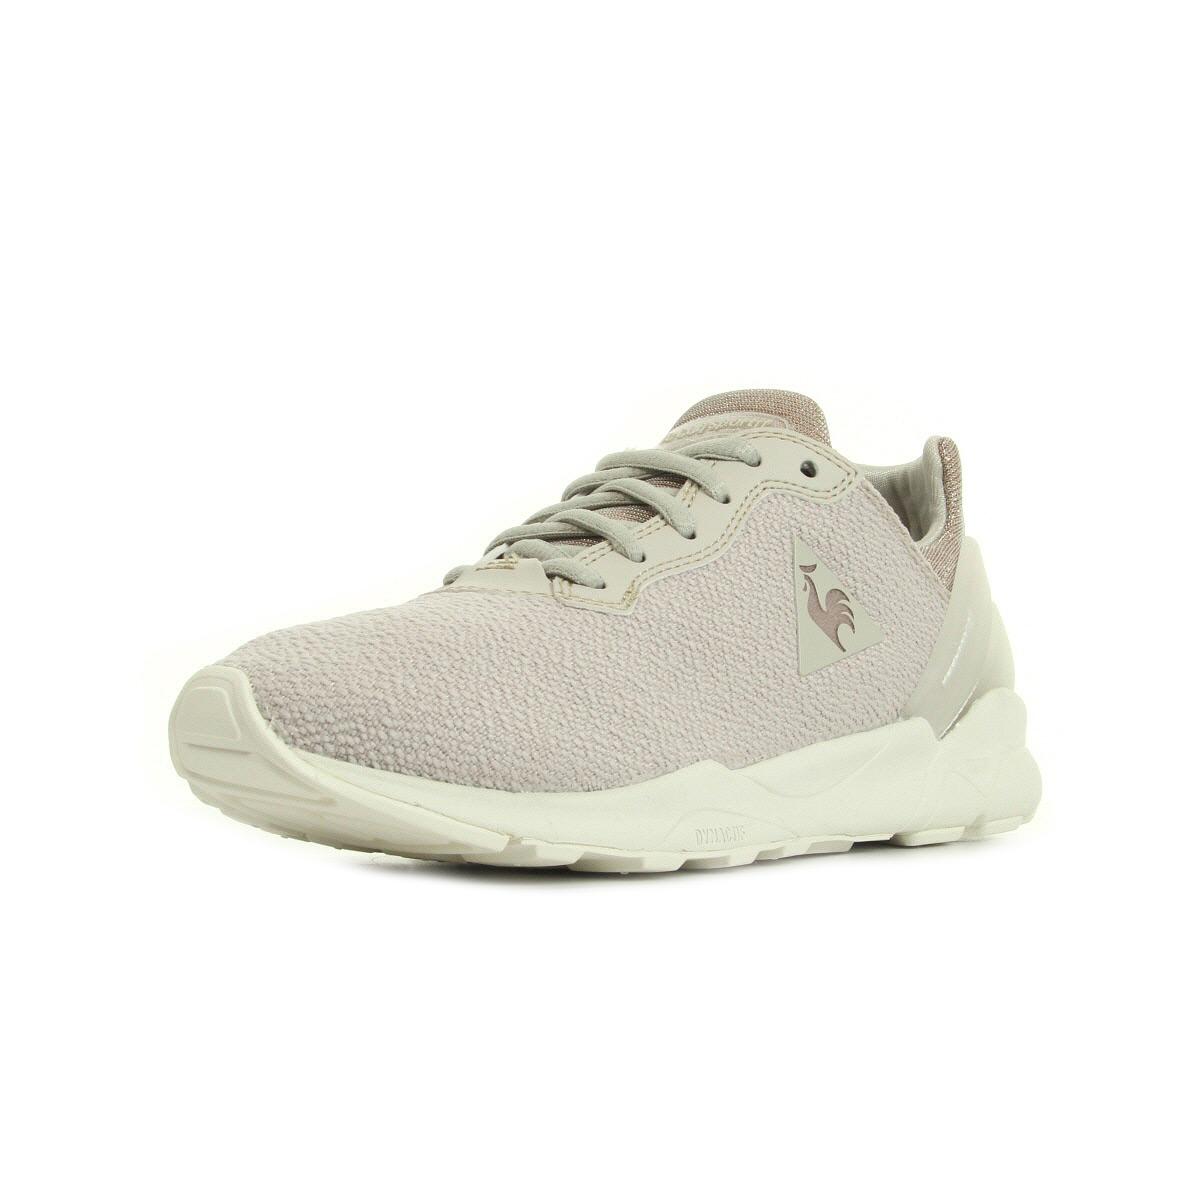 Nike WMNS Initiator (Wide), Chaussures de Trail Femme, Argenté (Metallic Silver/Ice Blue-White-Cool Grey 001), 42 EU